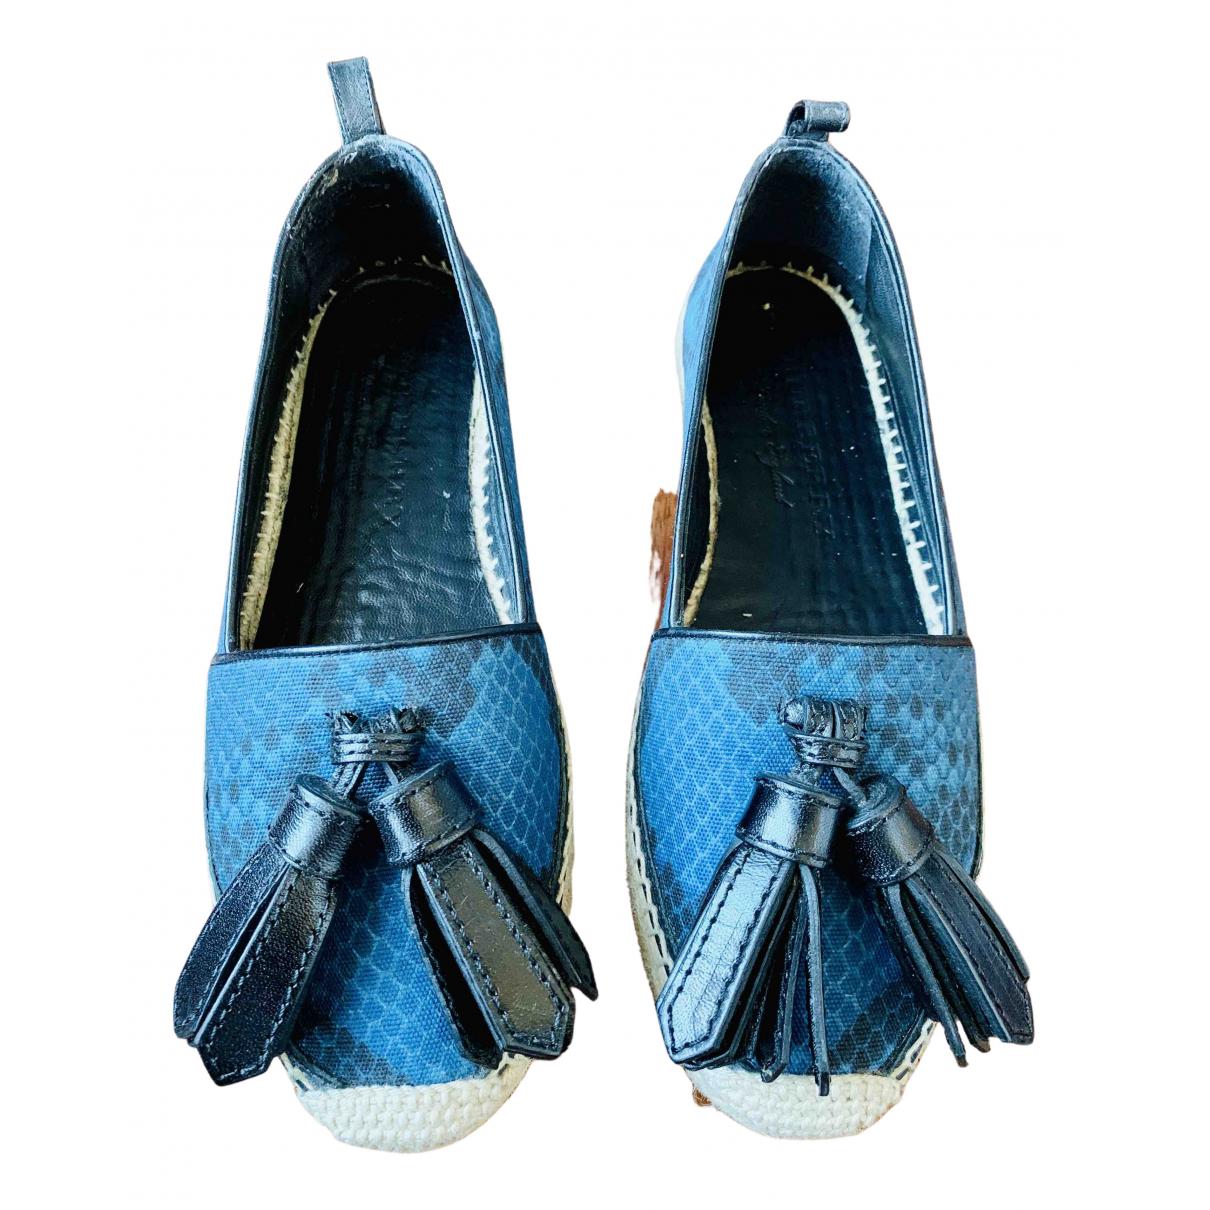 Burberry \N Espadrilles in  Blau Leinen